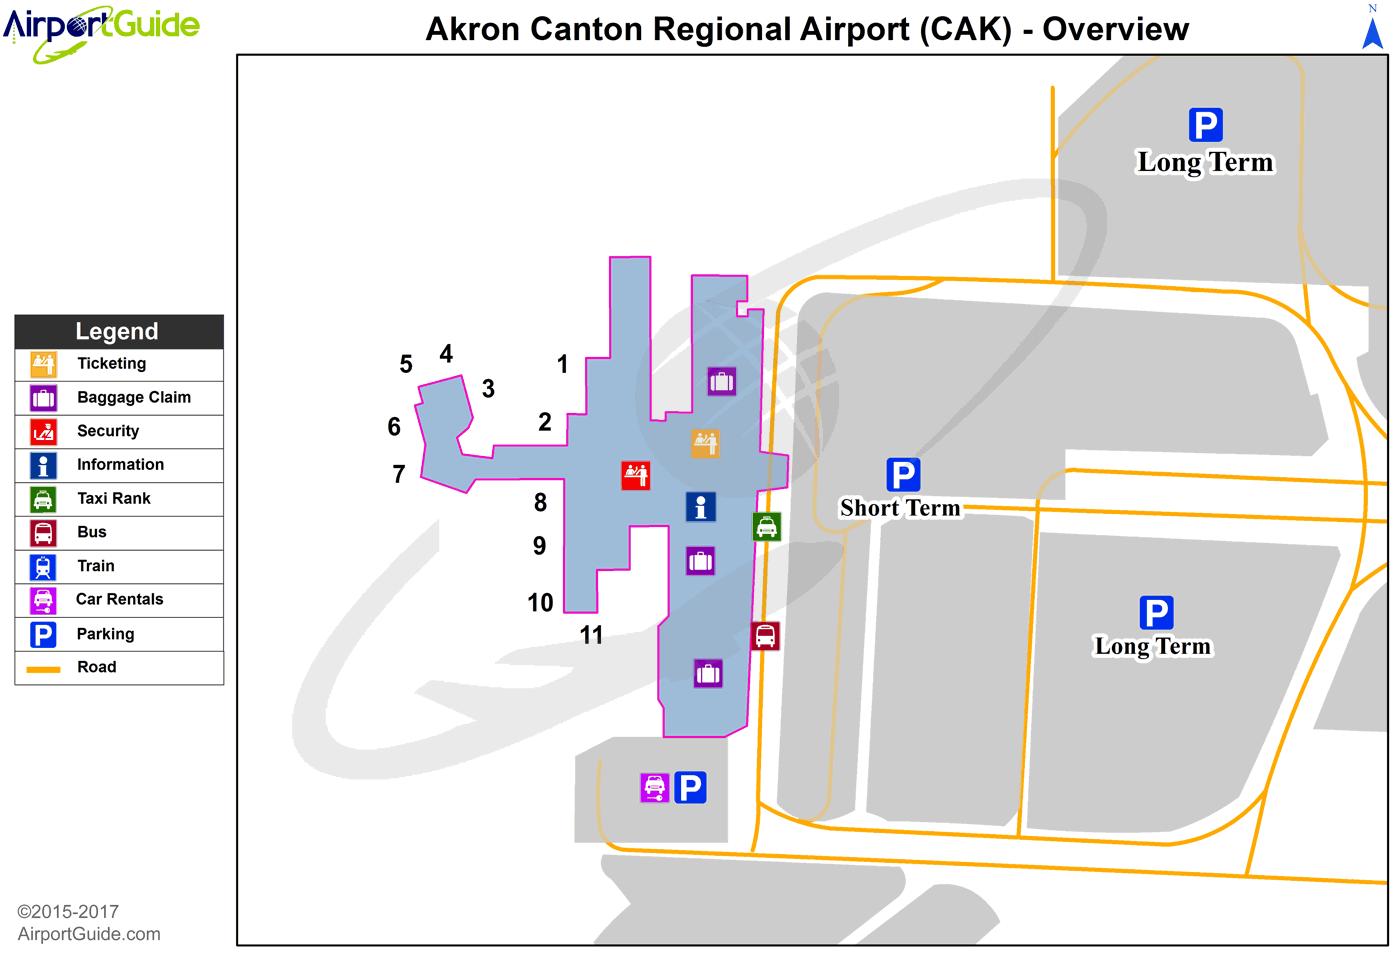 Cak Airport Map Akron   Akron Canton Regional (CAK) Airport Terminal Maps